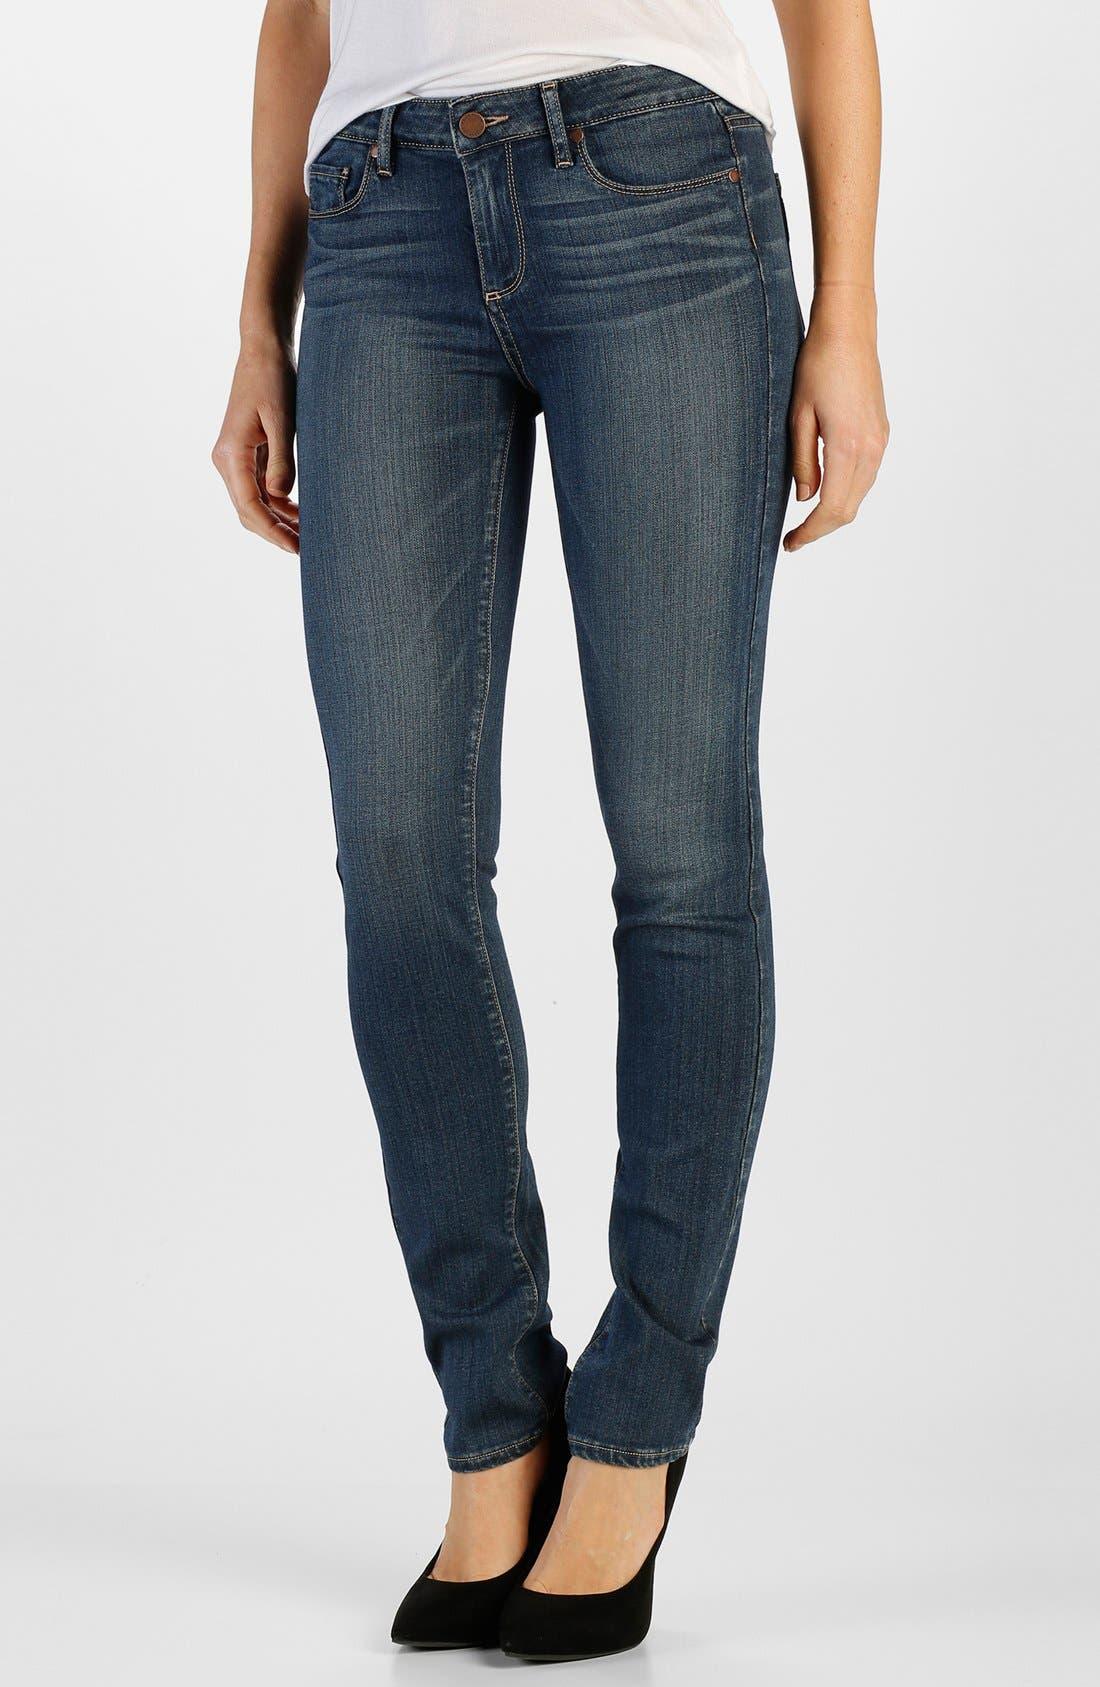 Main Image - Paige Denim 'Transcend - Skyline' Skinny Jeans (Lex)